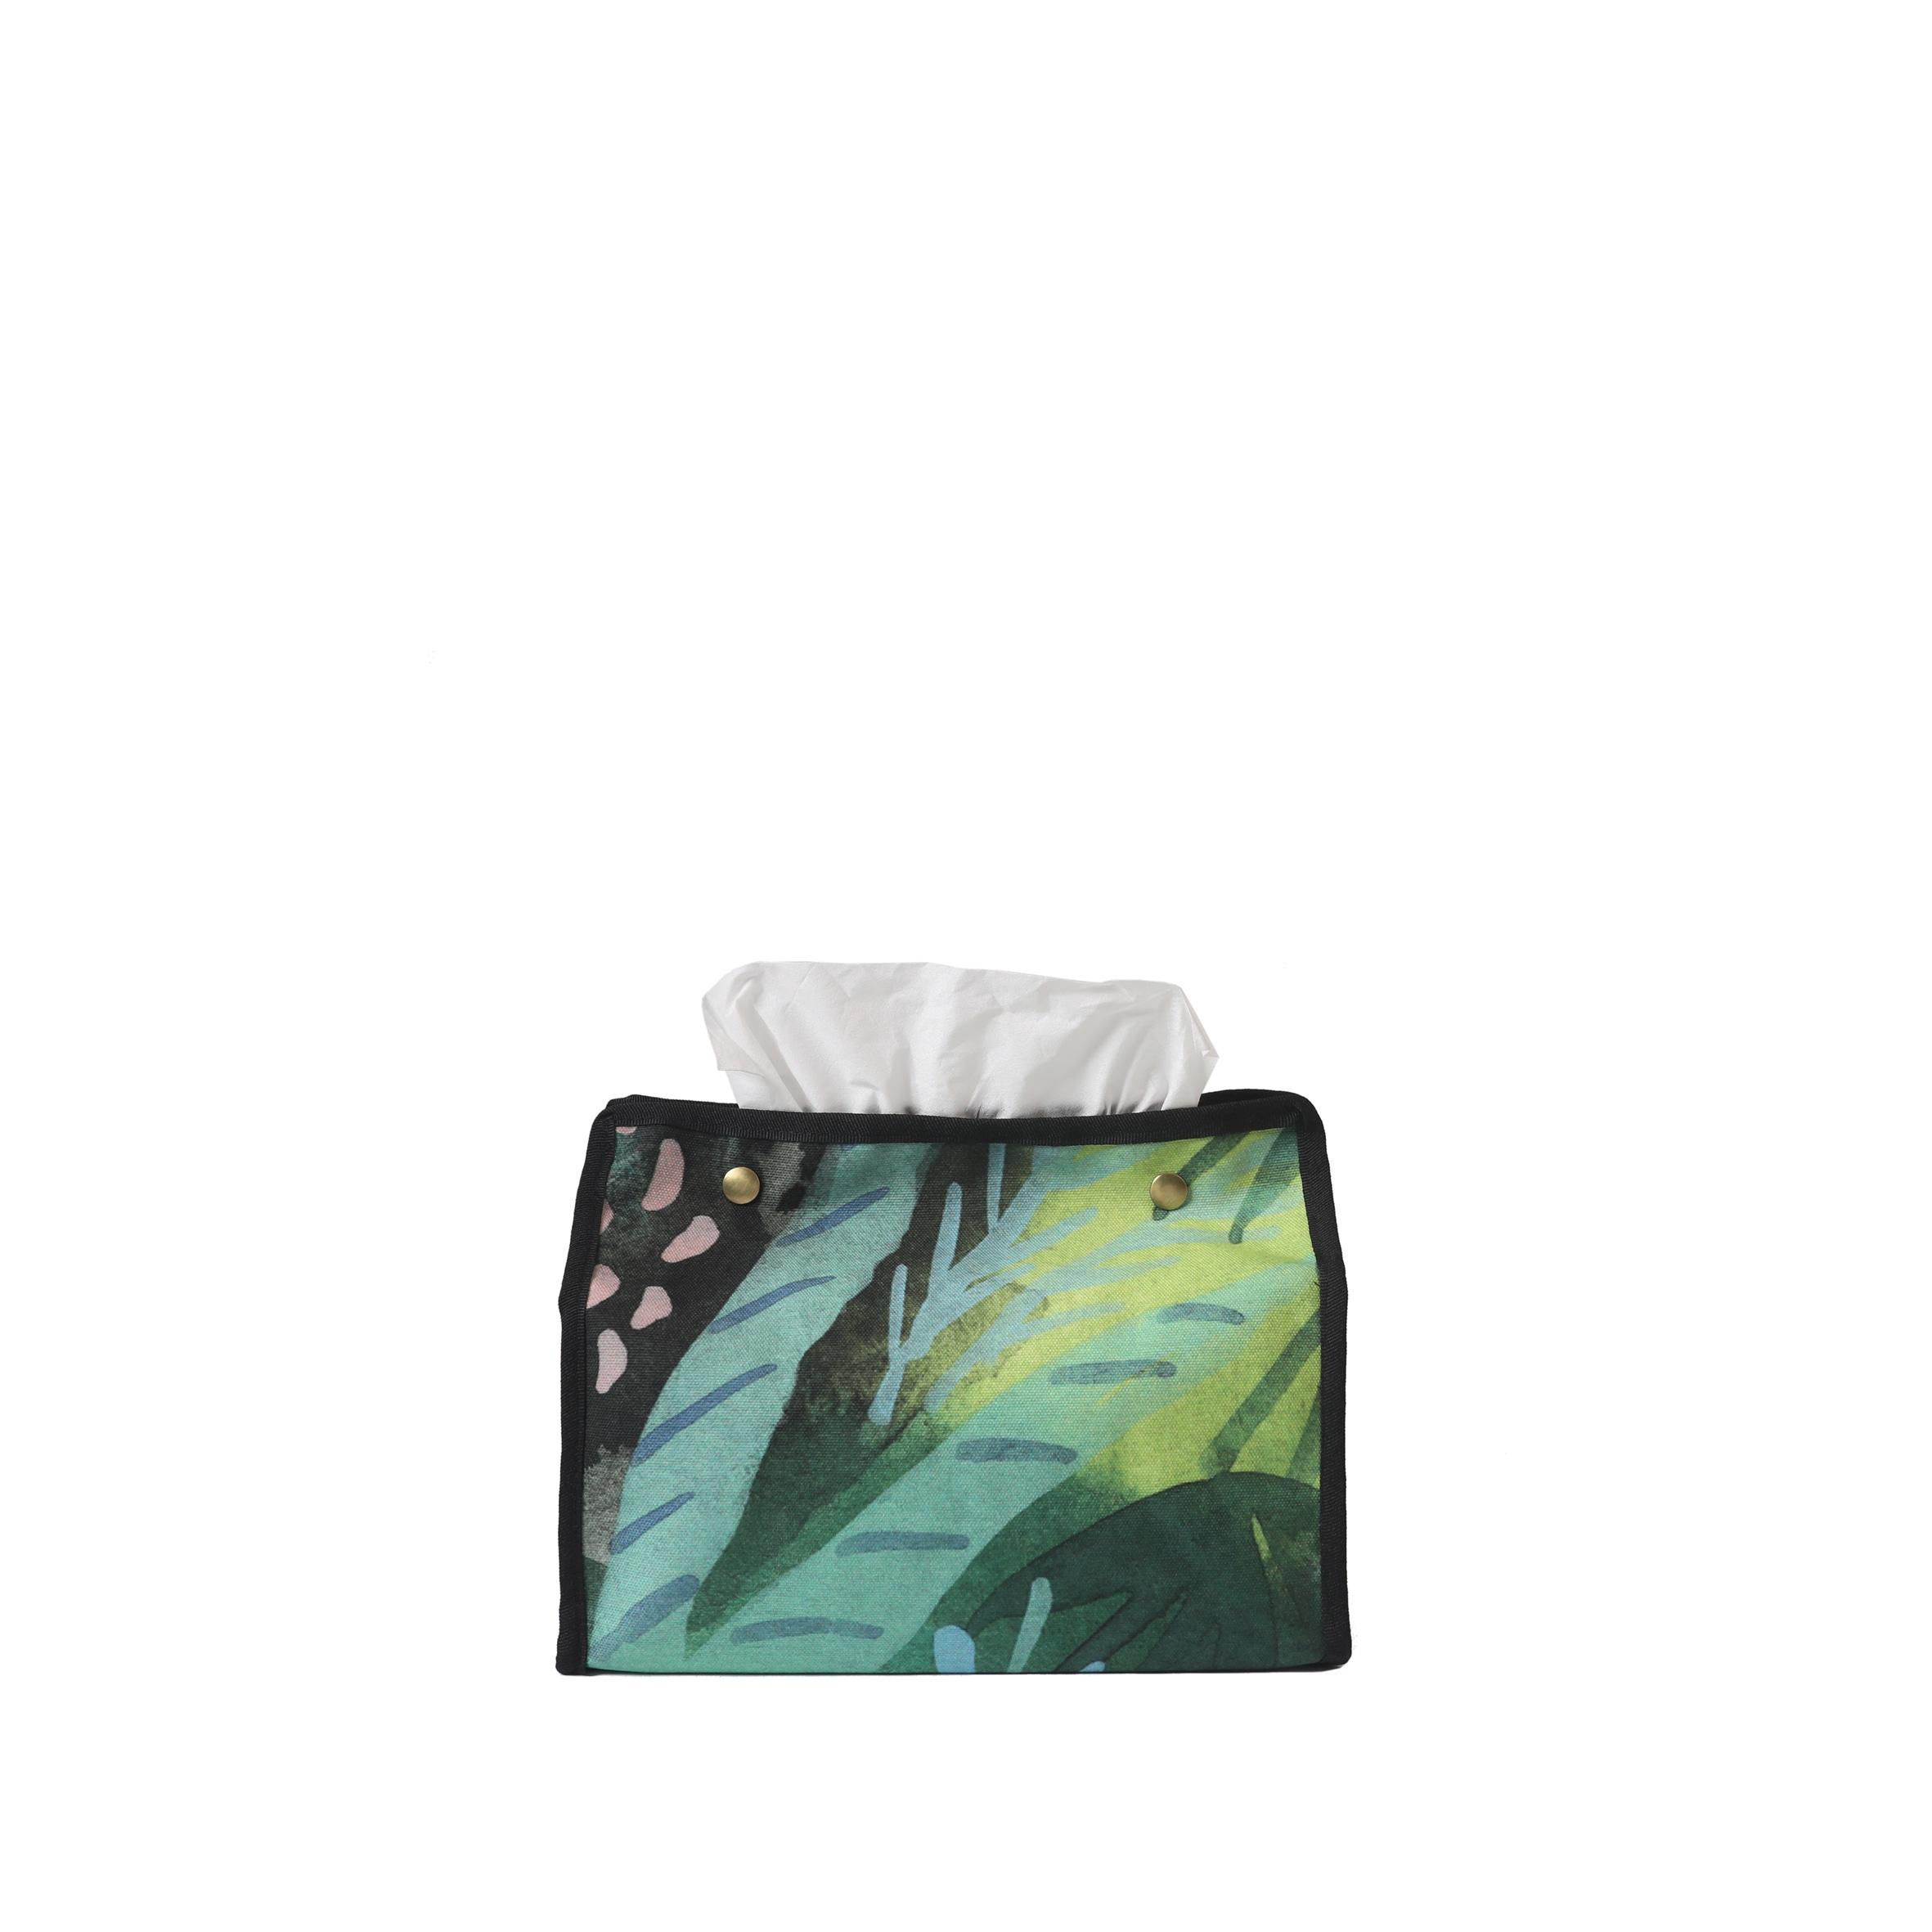 Anggrek Hutan Kotak Tissue